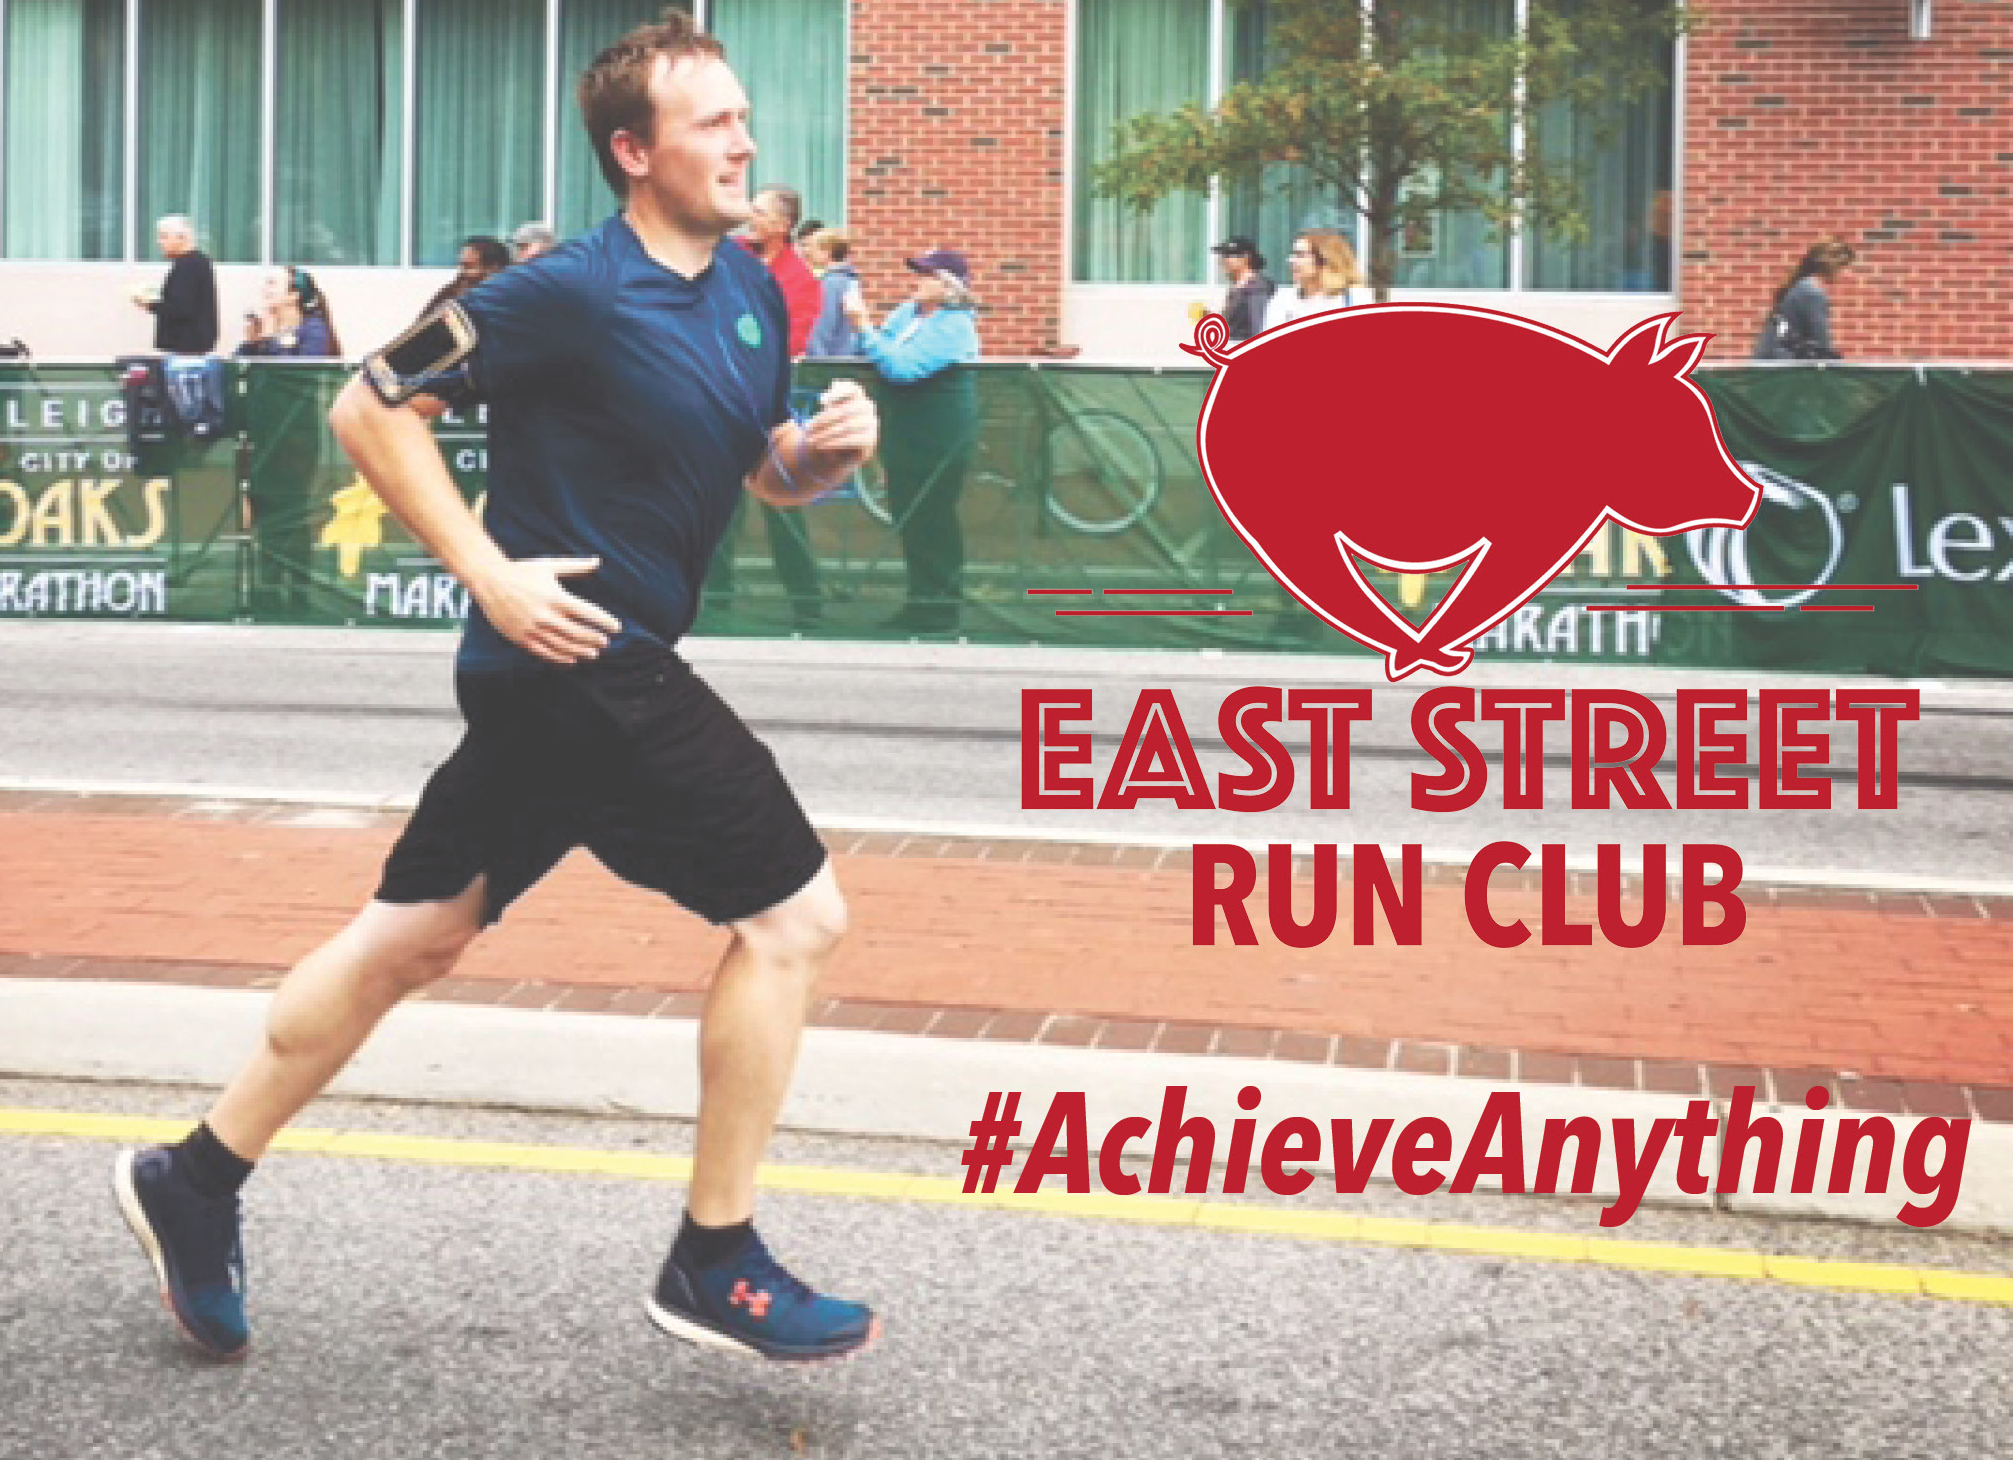 Runner East Street Run Club Graphic